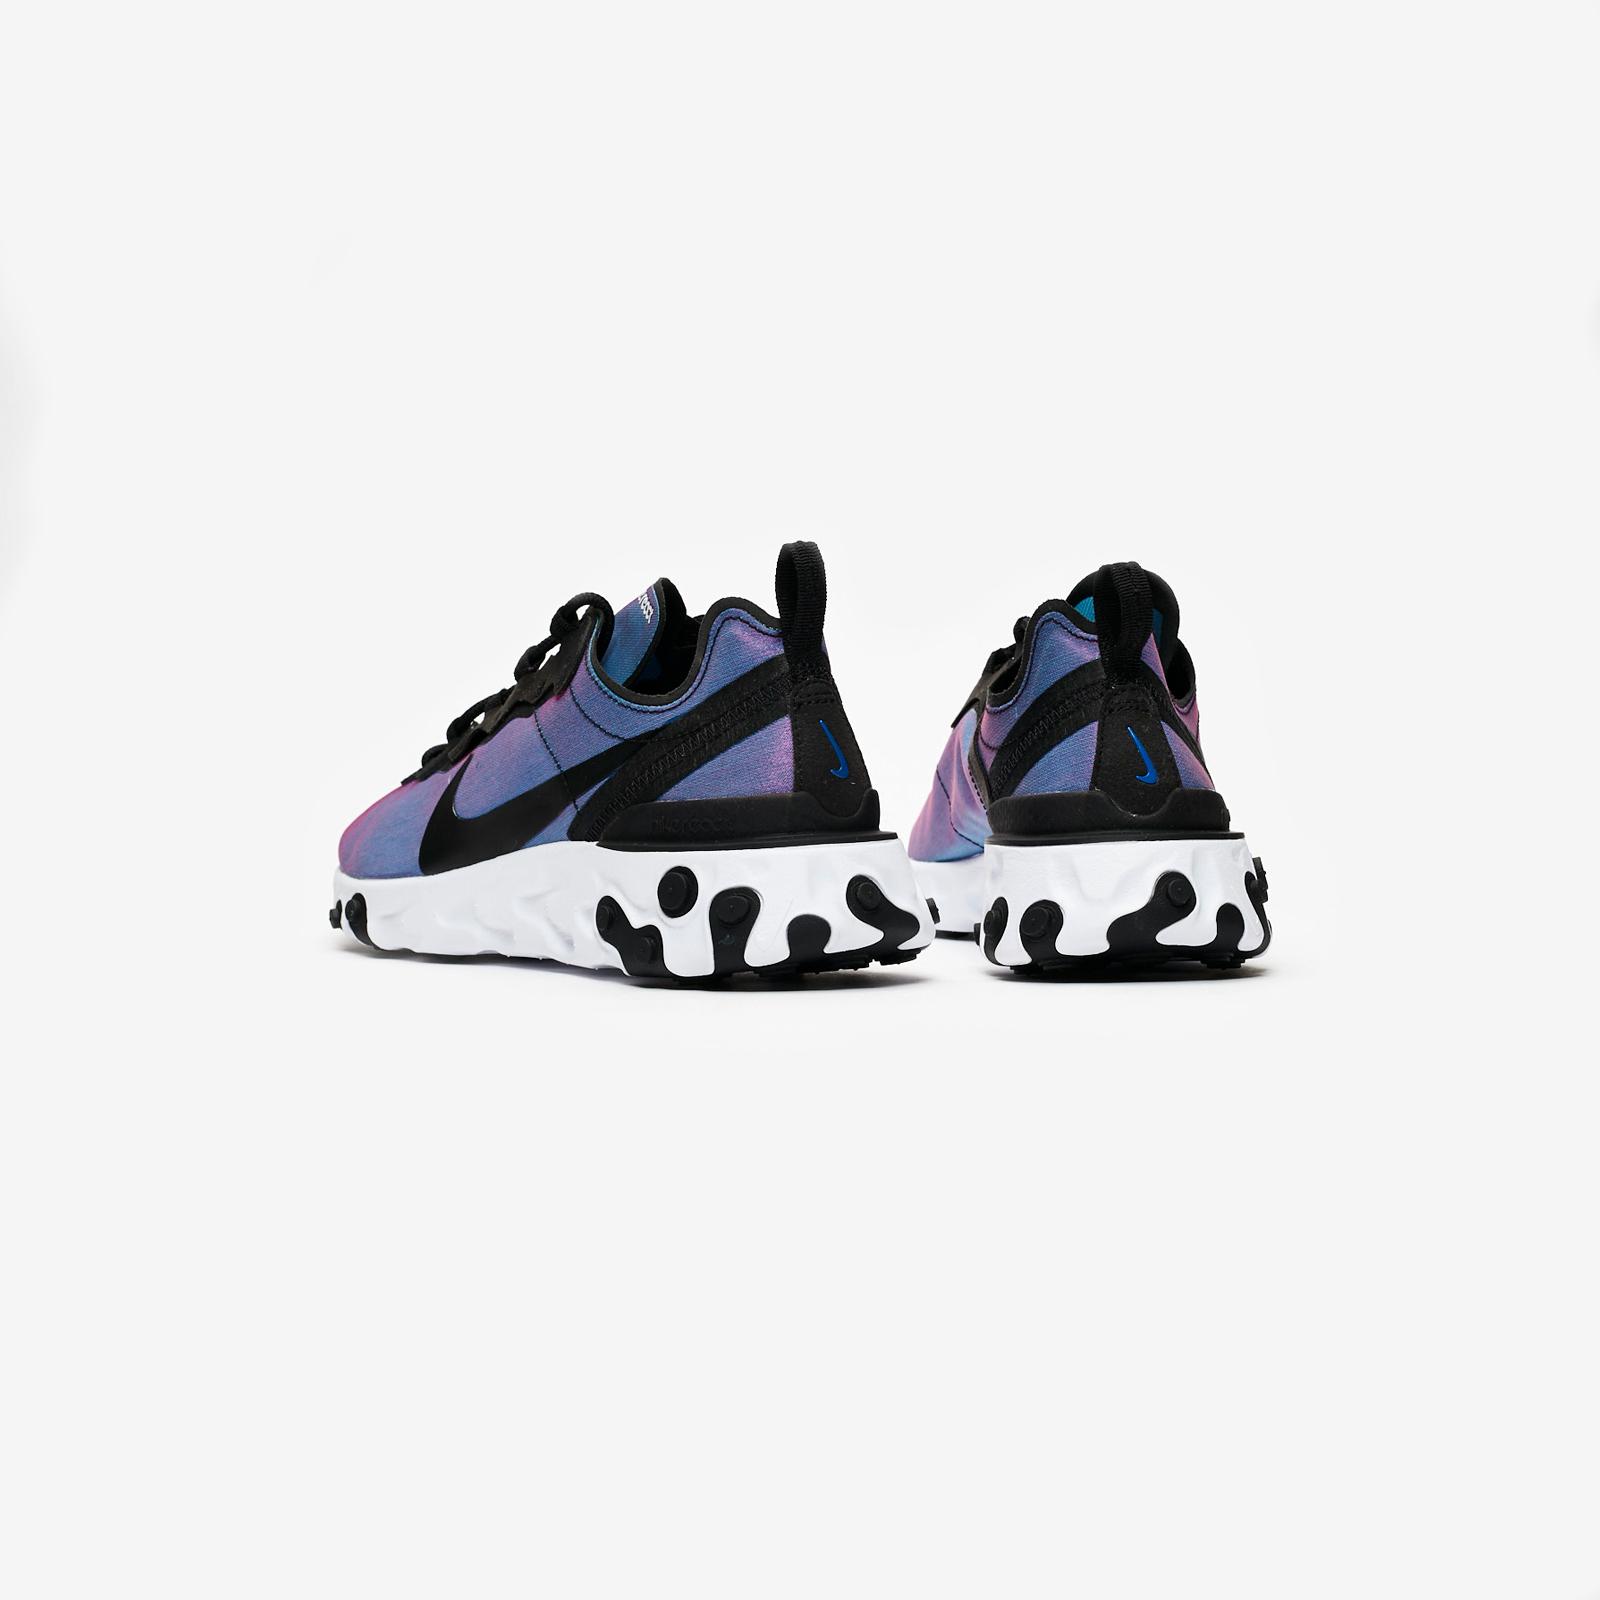 sports shoes c89f6 38d22 Nike Wmns React Element 55 Premium - Cd6964-001 - Sneakersnstuff   sneakers    streetwear online since 1999